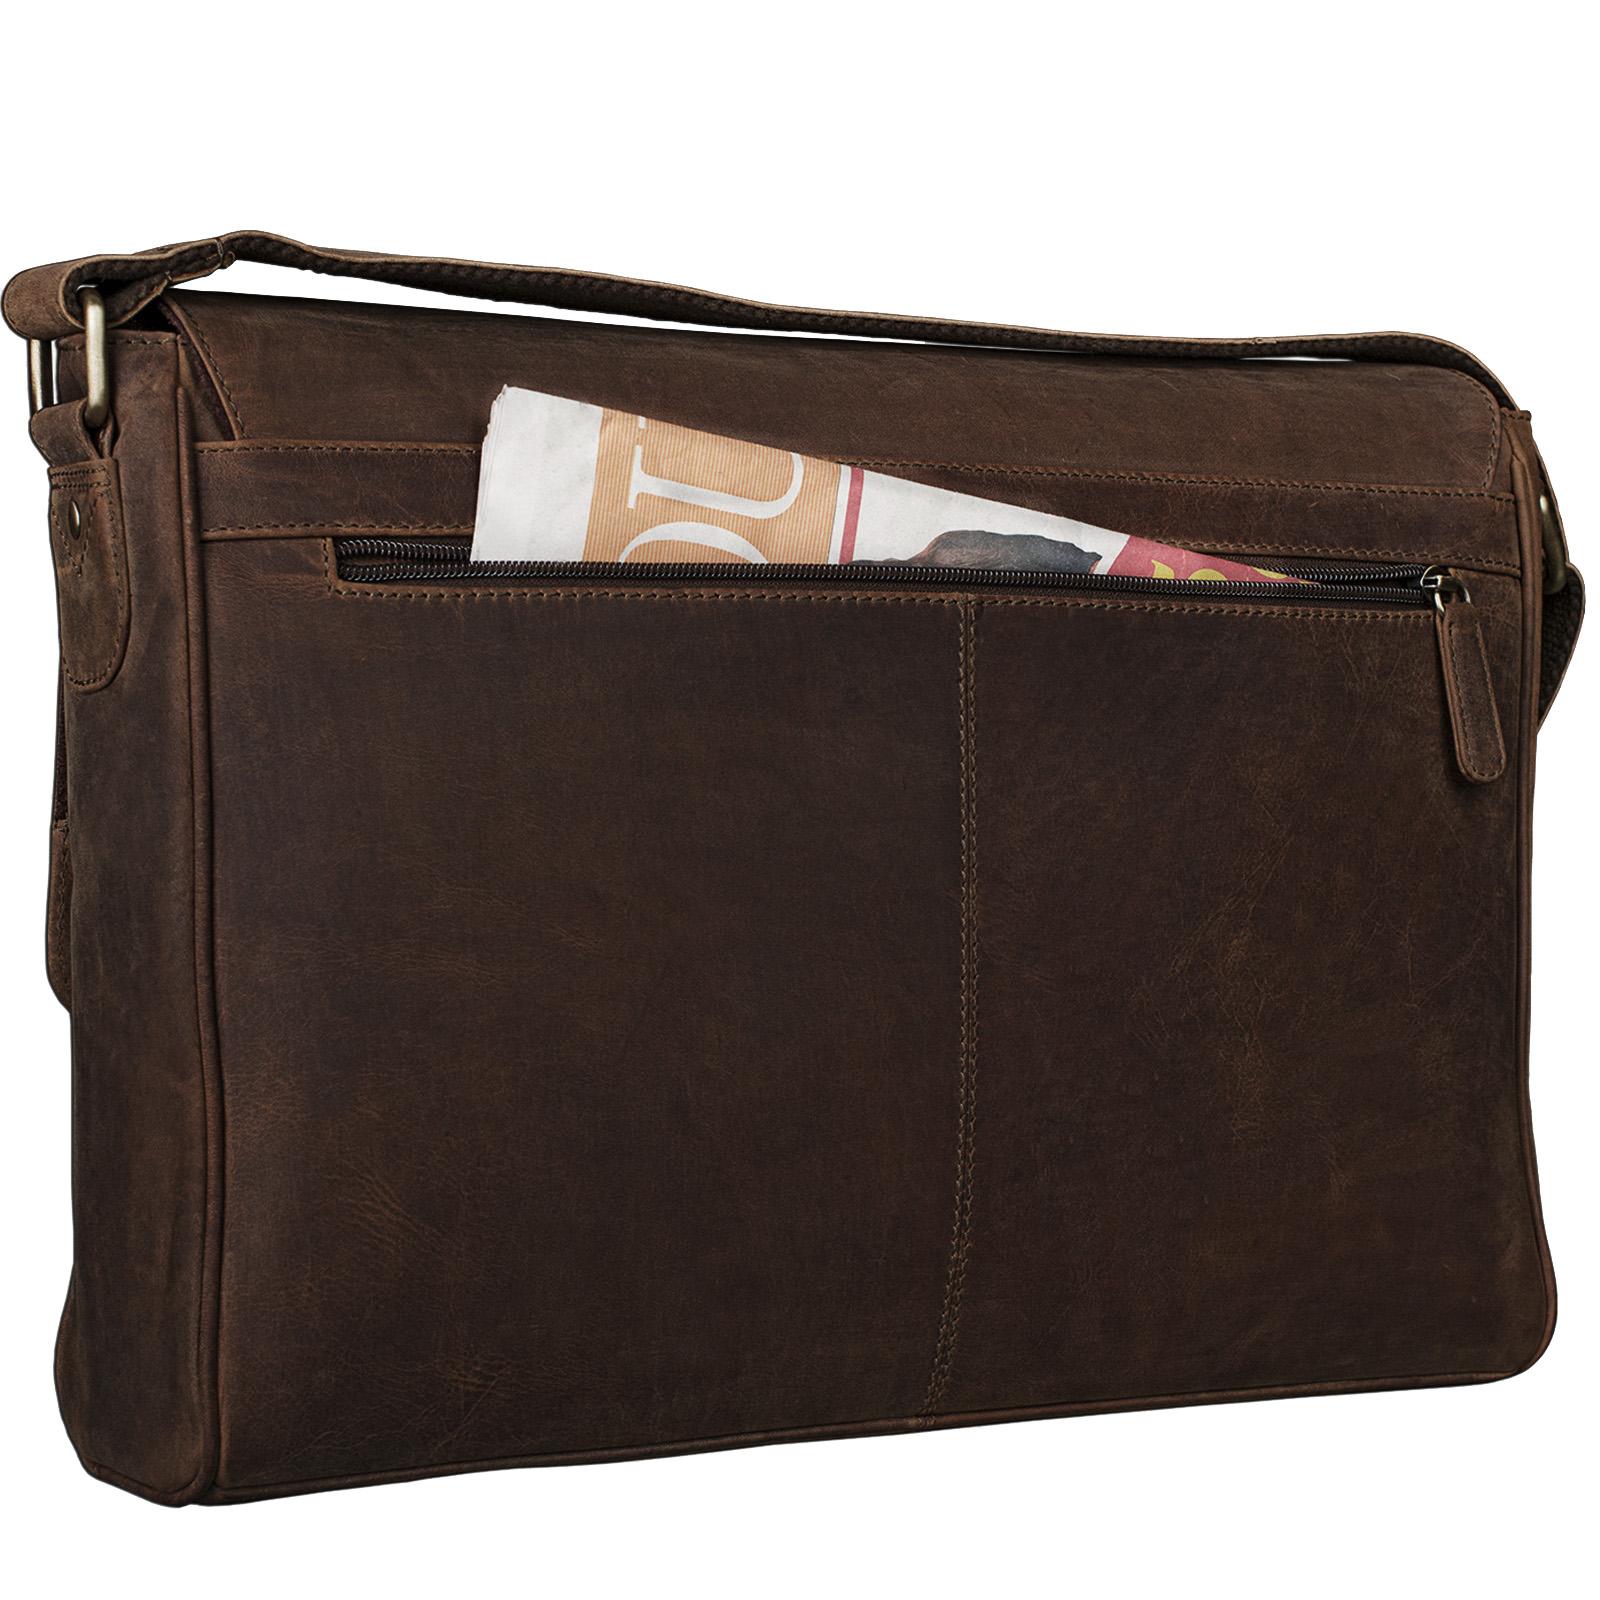 "STILORD ""Oskar"" Umhängetasche aus echtem Rinds-Leder Unisex Messenger Bag Business Unitasche Bürotasche Leder  - Bild 6"